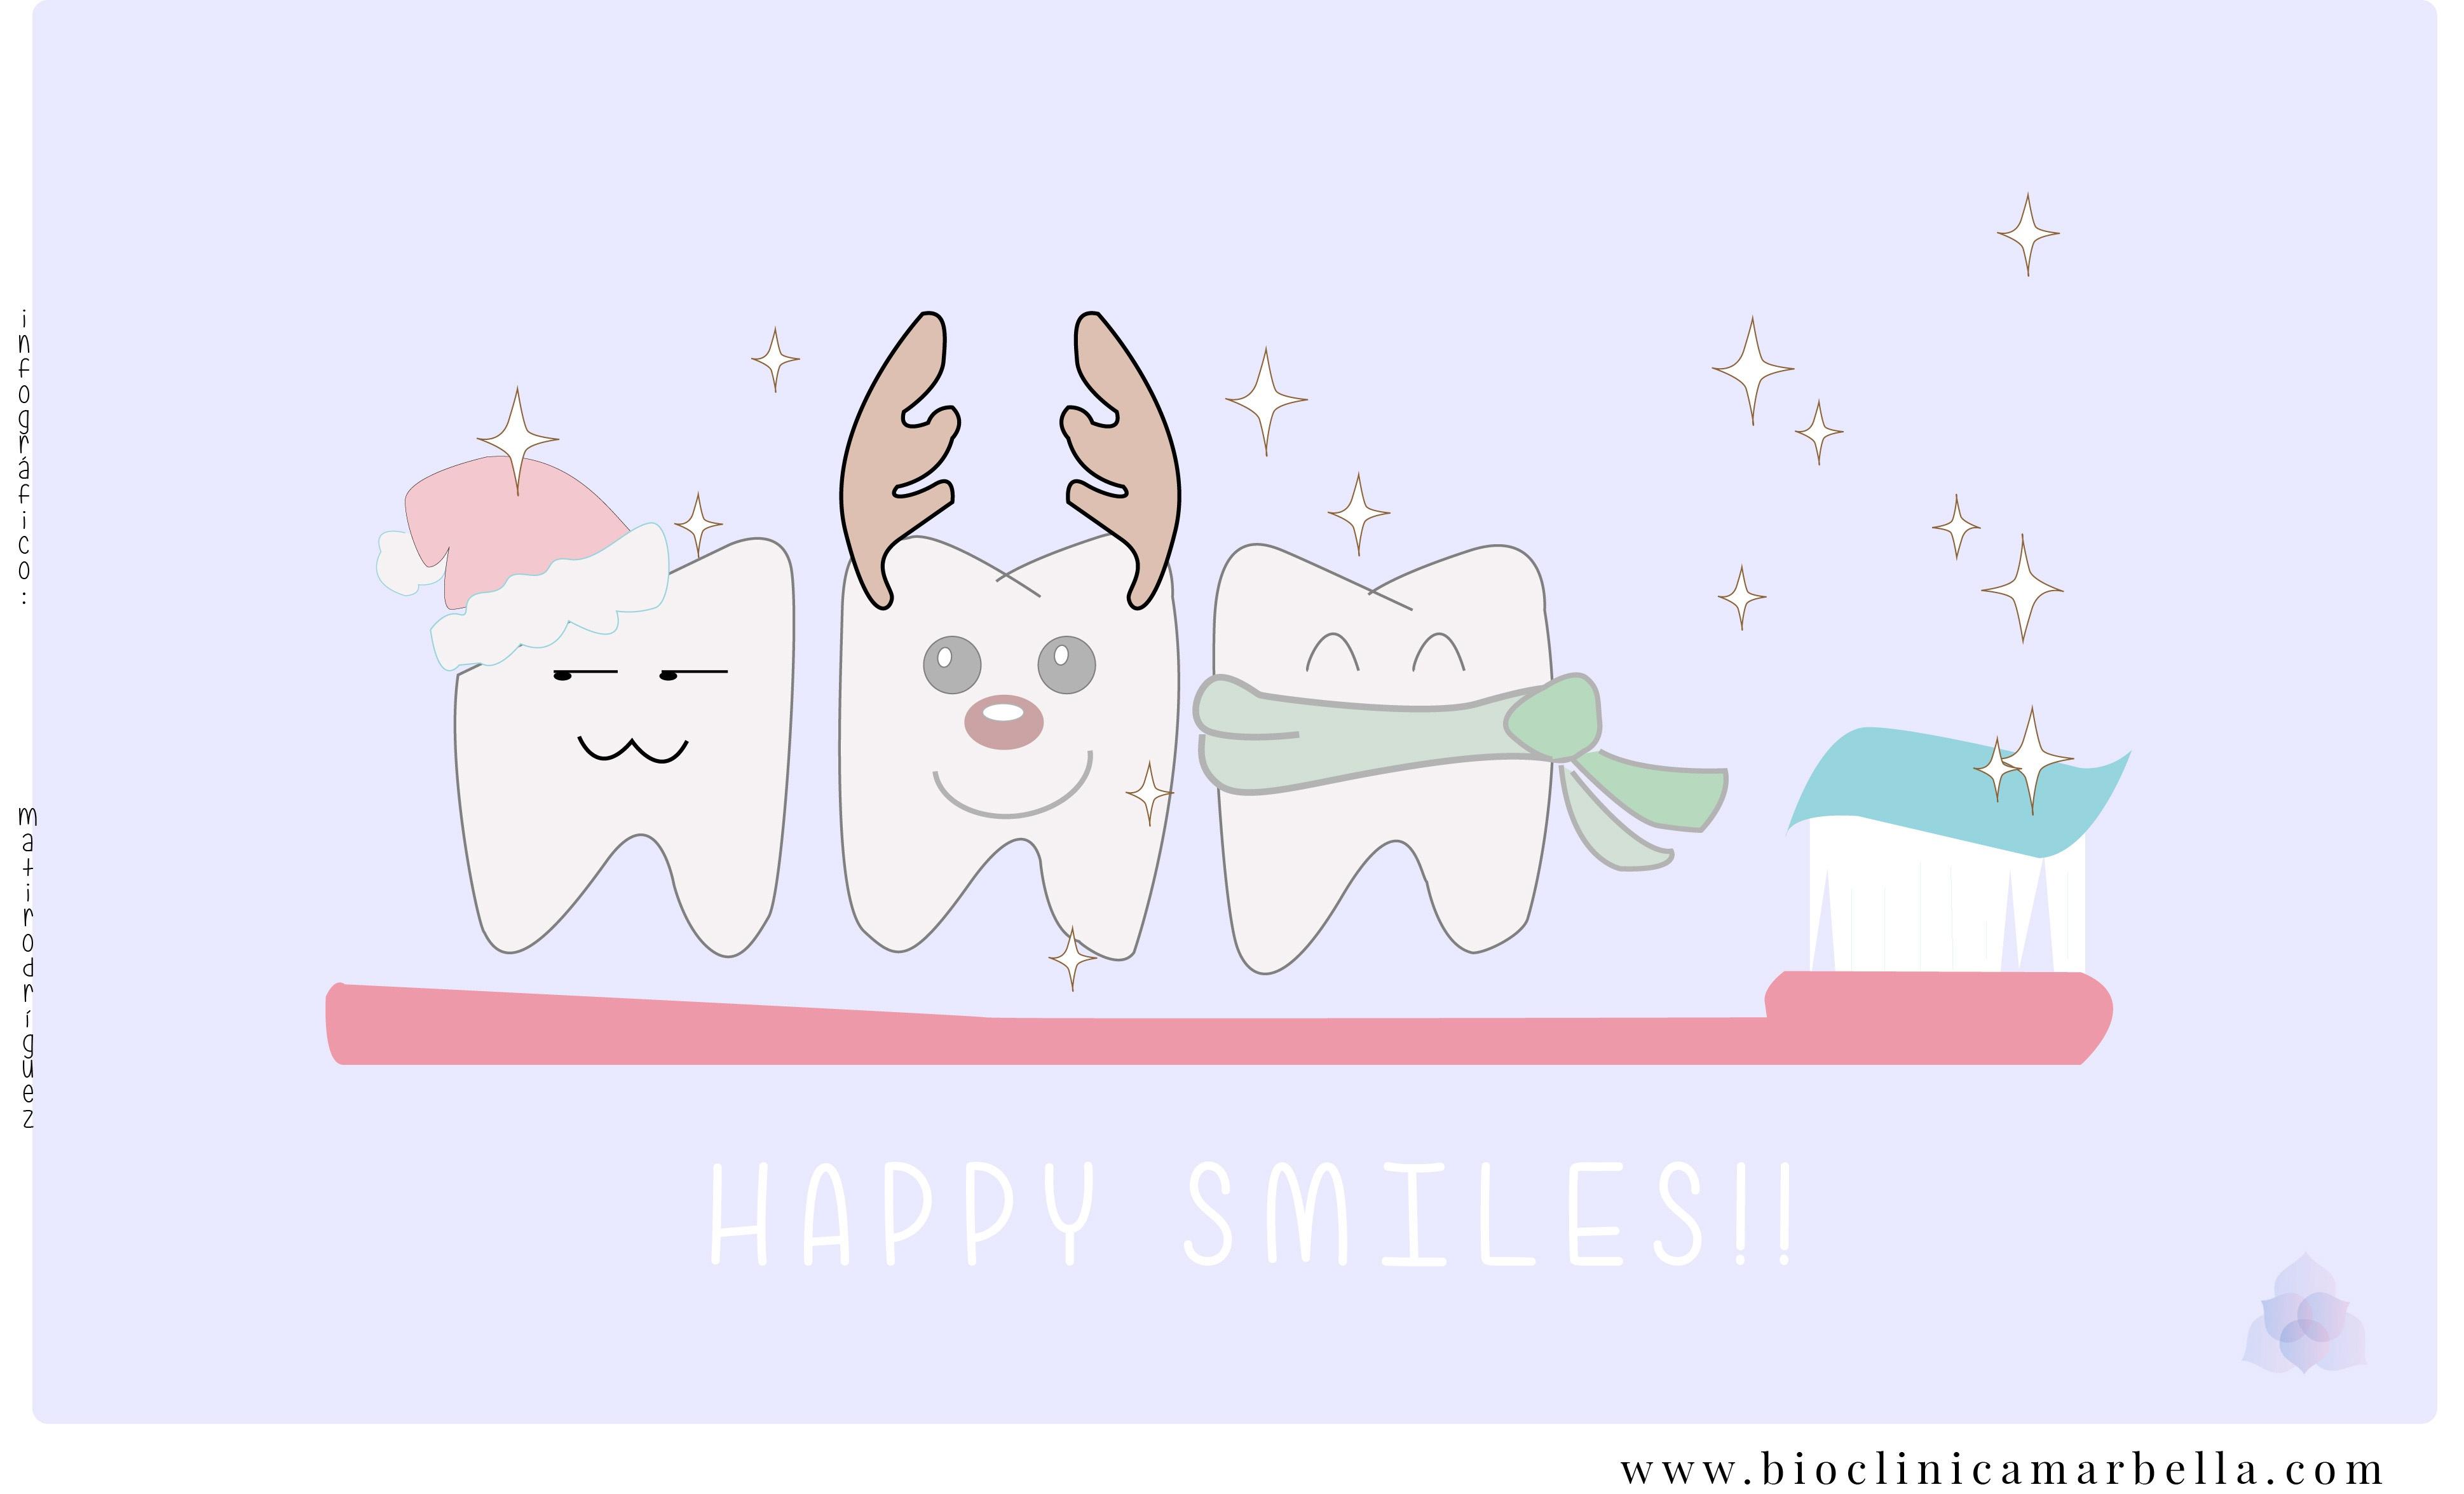 smile-dental-decay-odontology-bioclinica-marbella.jpg